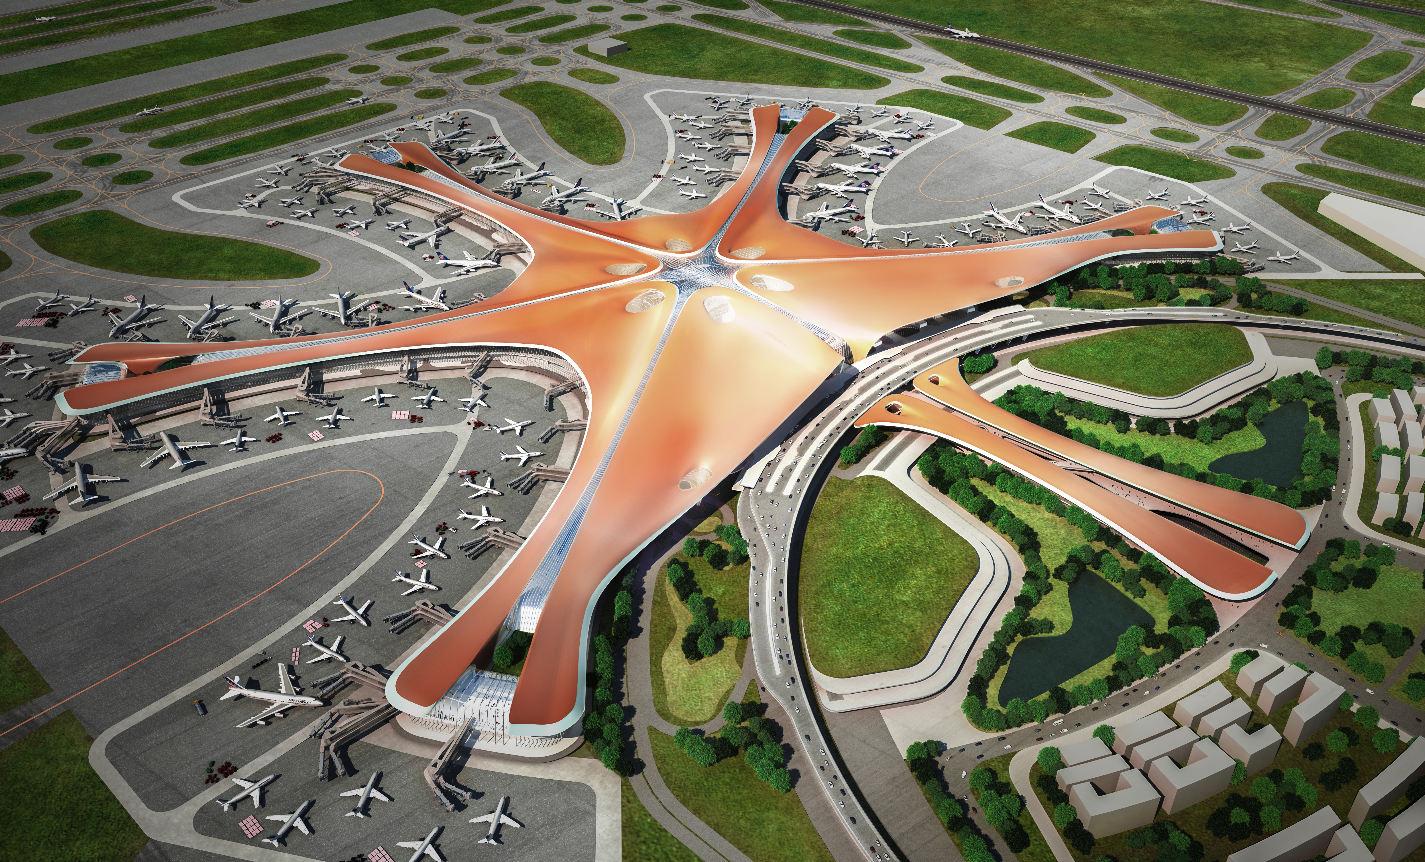 Beijing Daxing International Airport: soon into service